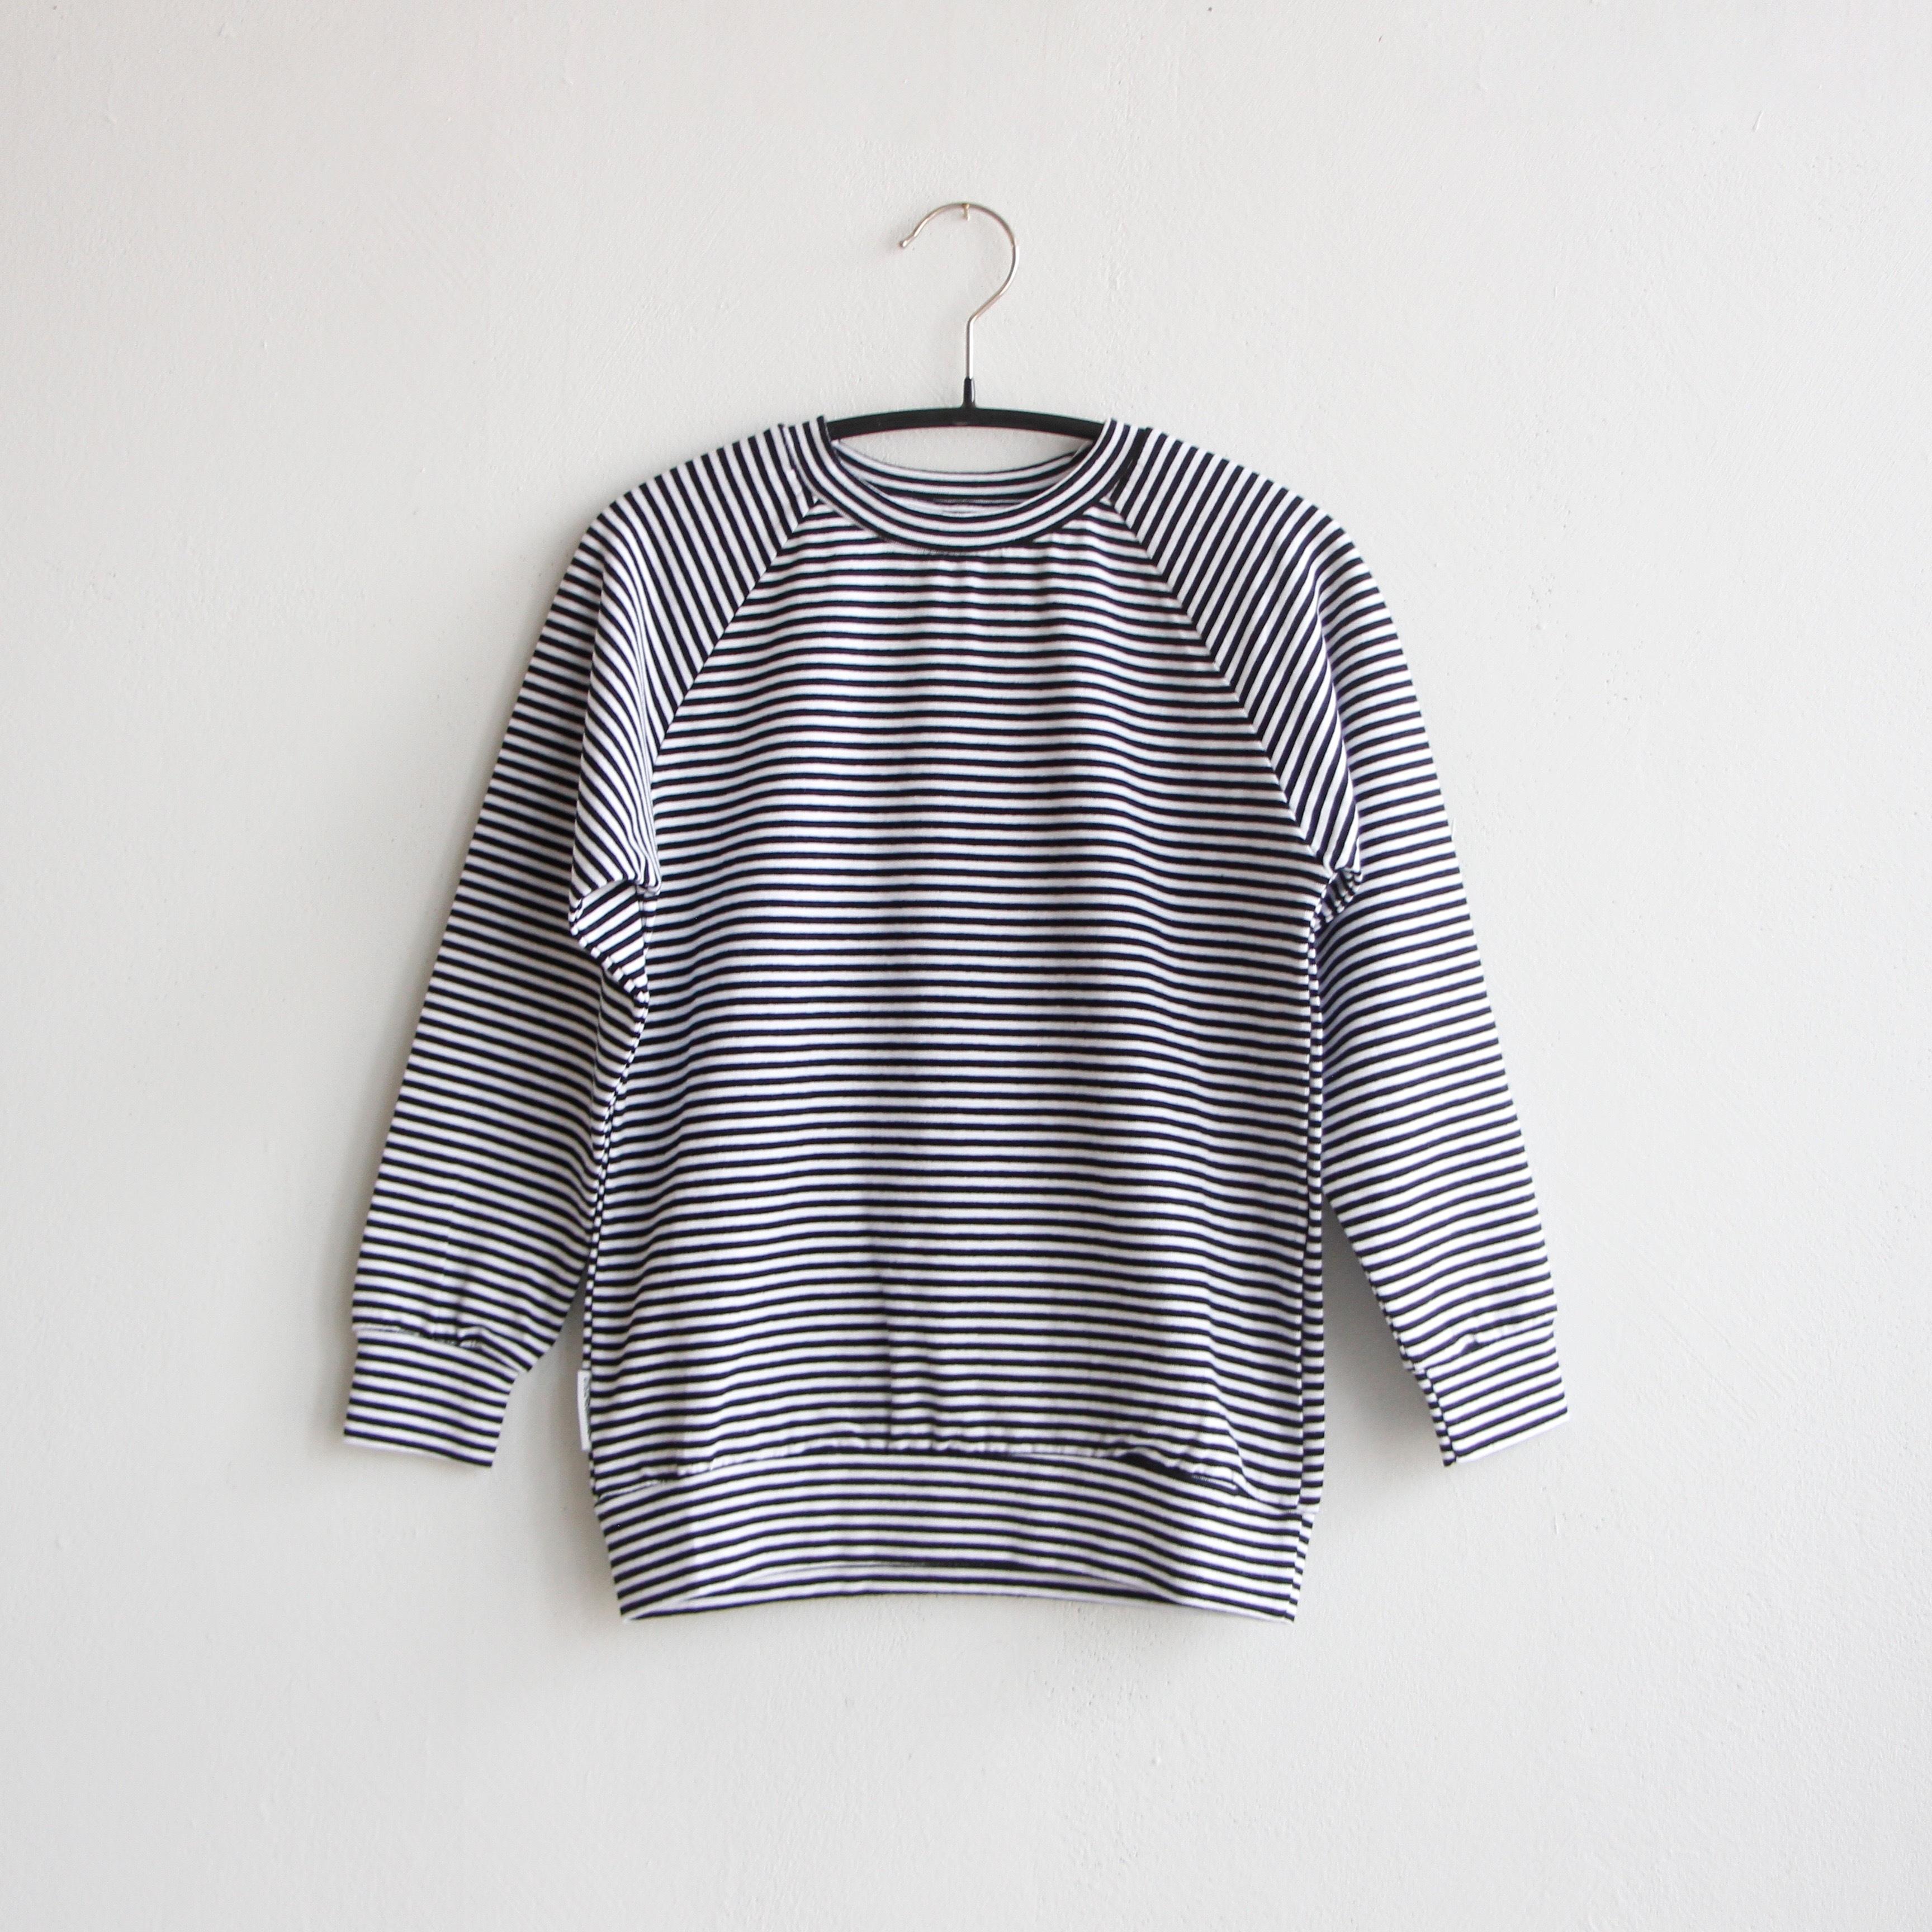 《MINGO.》Long sleeve / Stripes